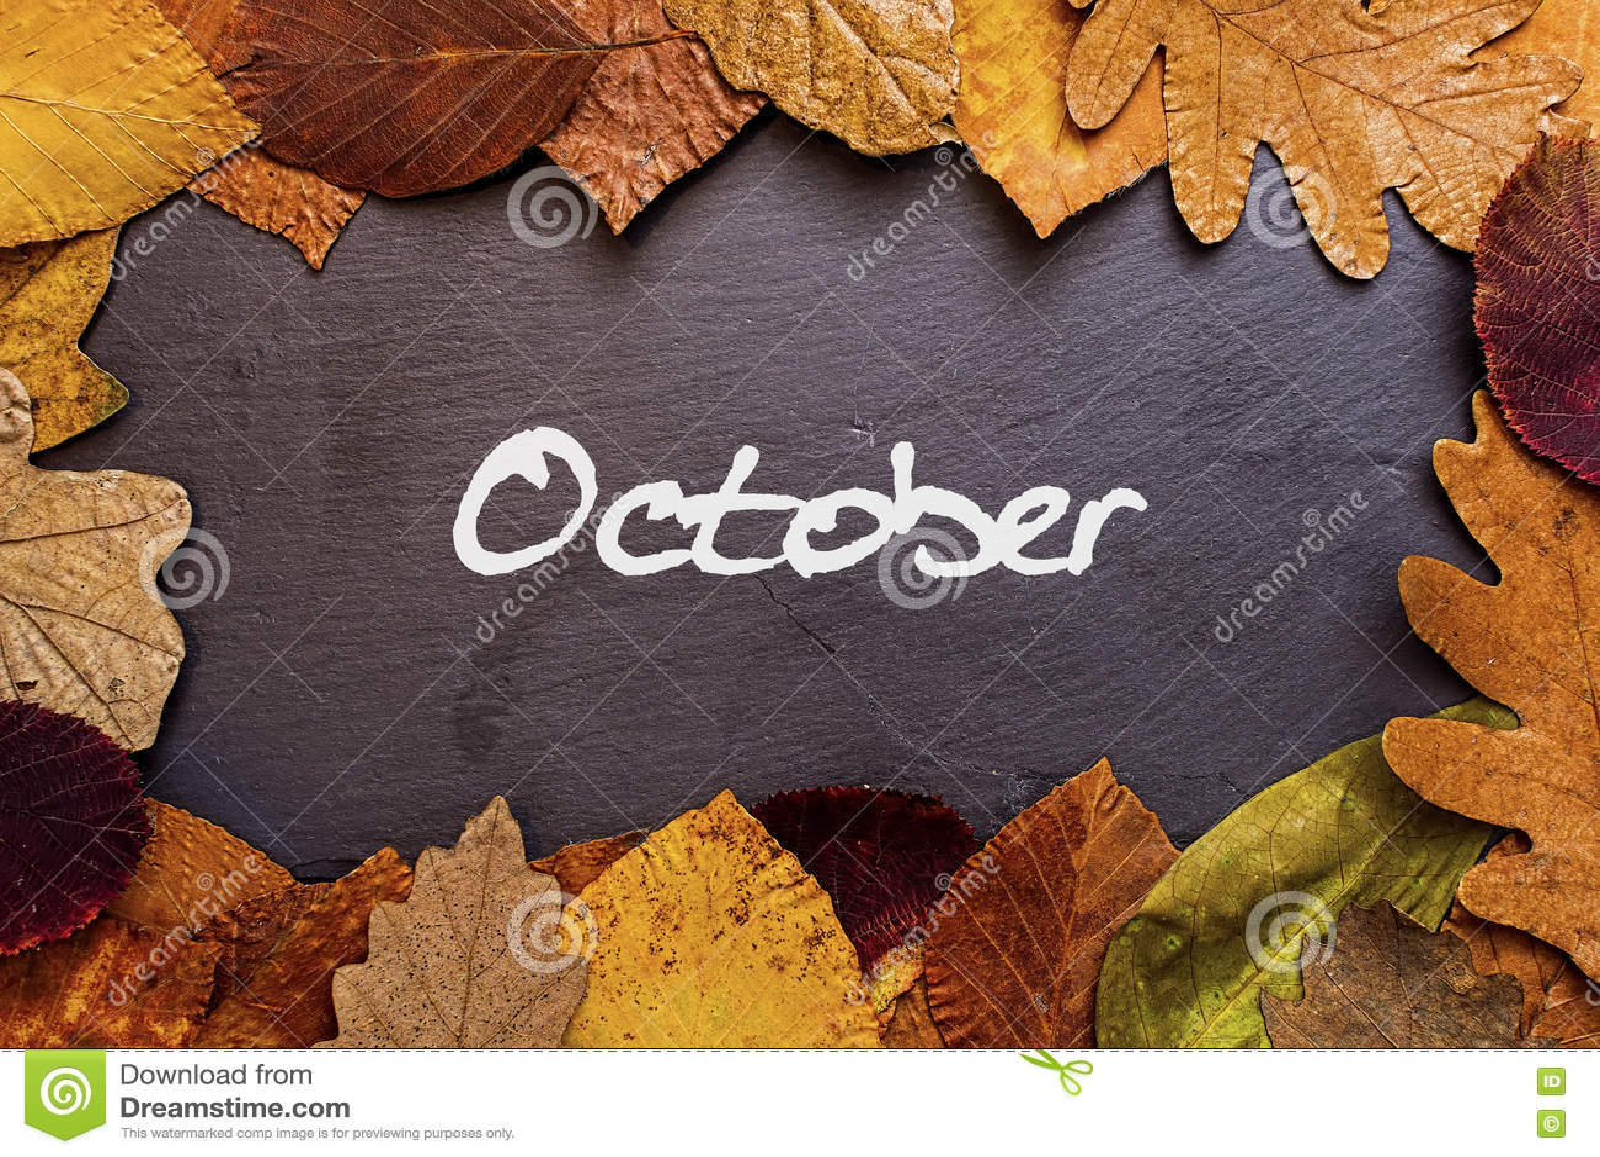 Autumn Leaves Frame on Dark Stone Background. October Concept Wallpaper.